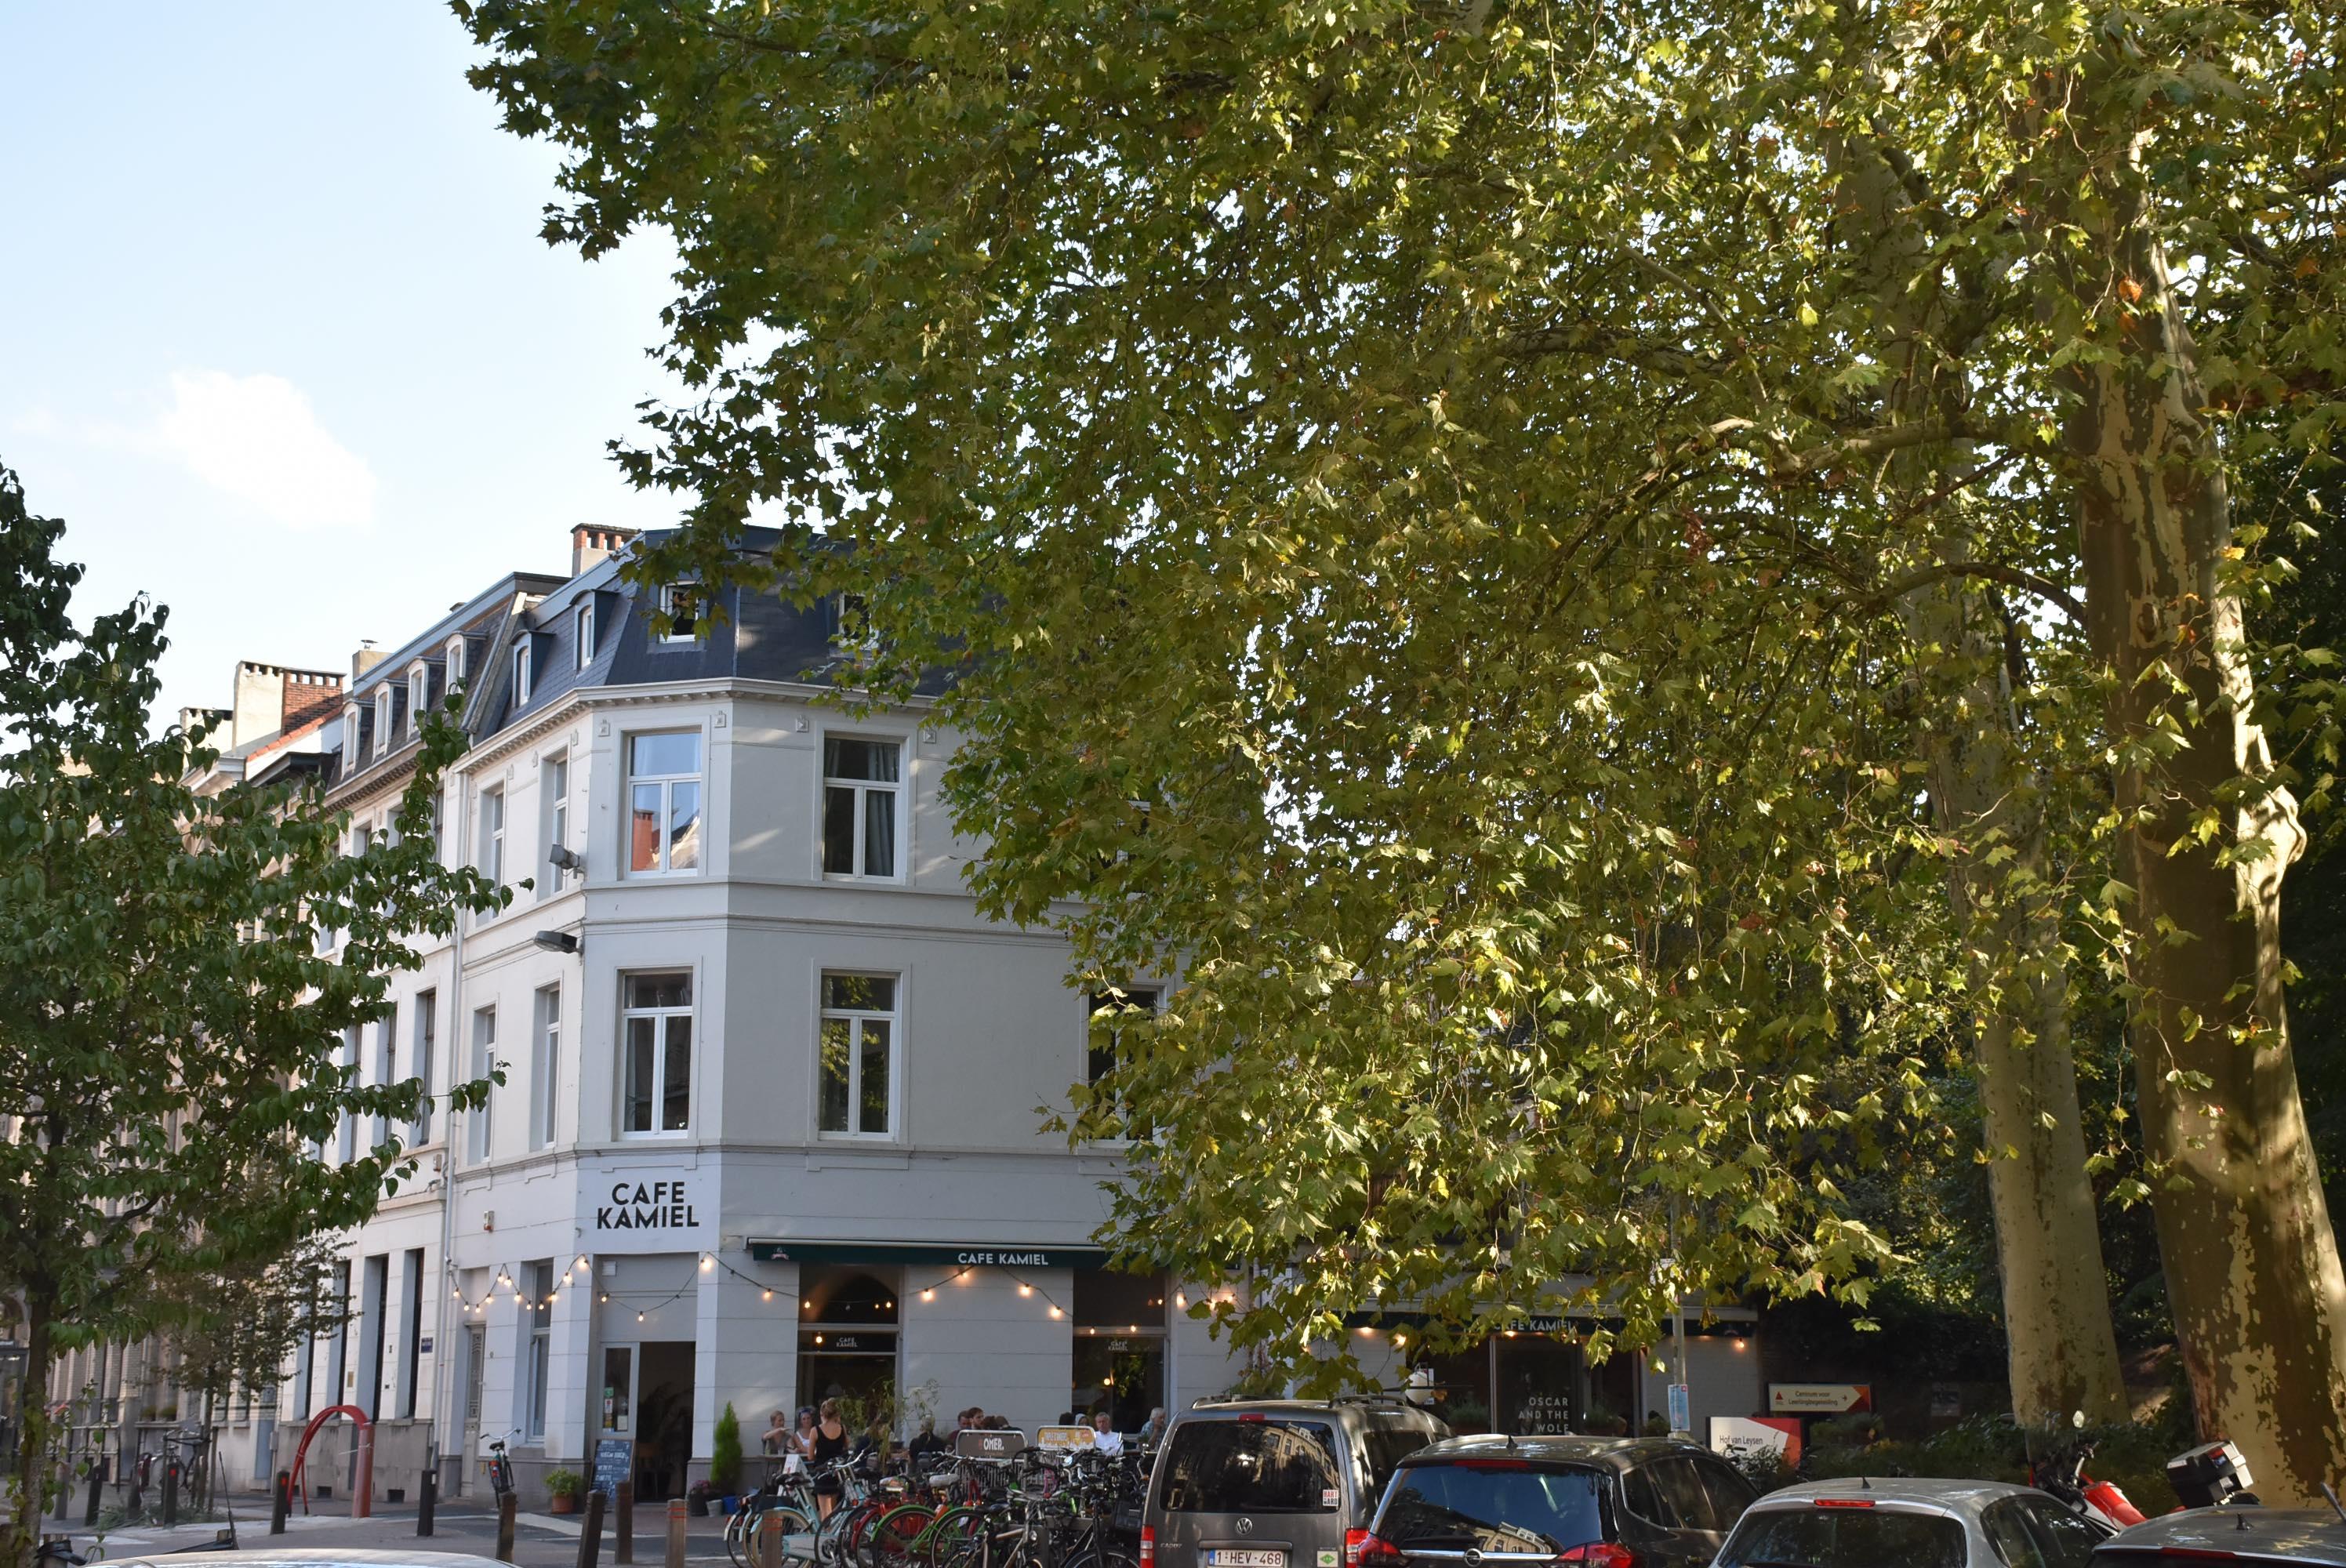 Café Kamiel - Coffee Bar - Antwerp